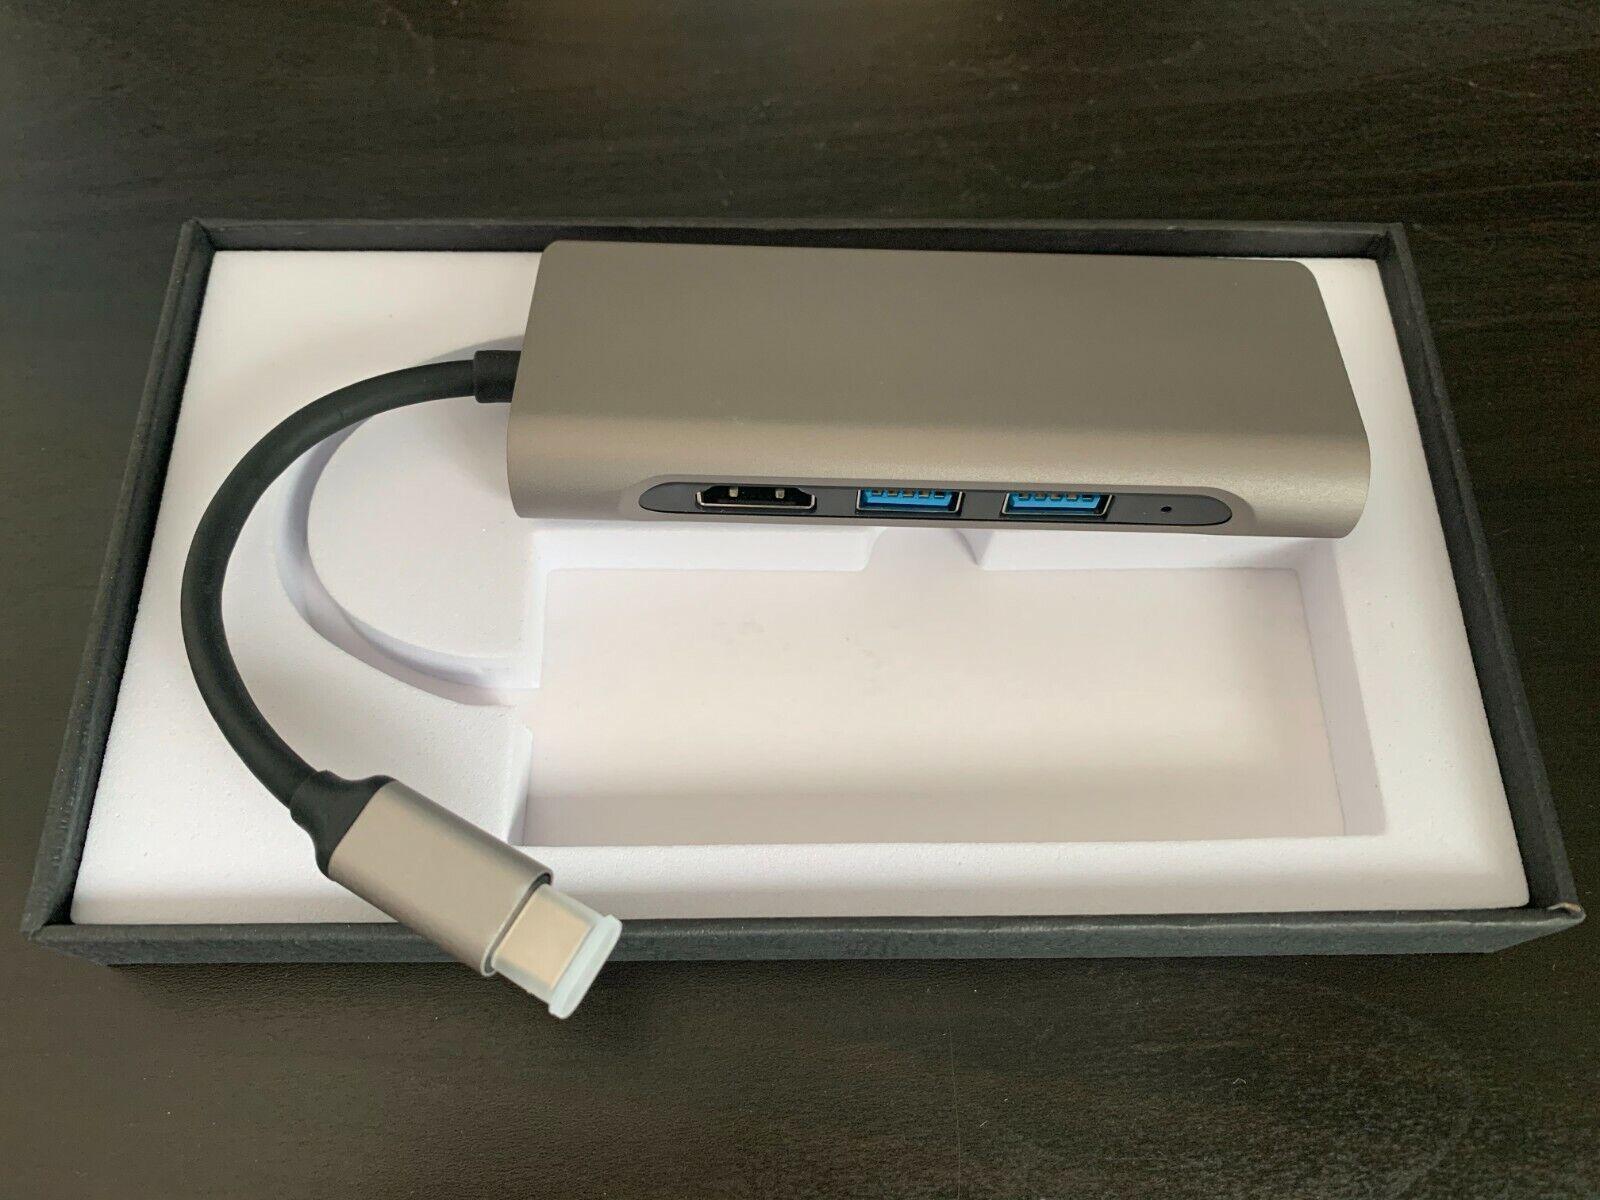 7-in-1 Hub Adapter USB TypeC Hub HDMI, 2 USB 3.0,SD, Micro SD, Super Gigabit LAN